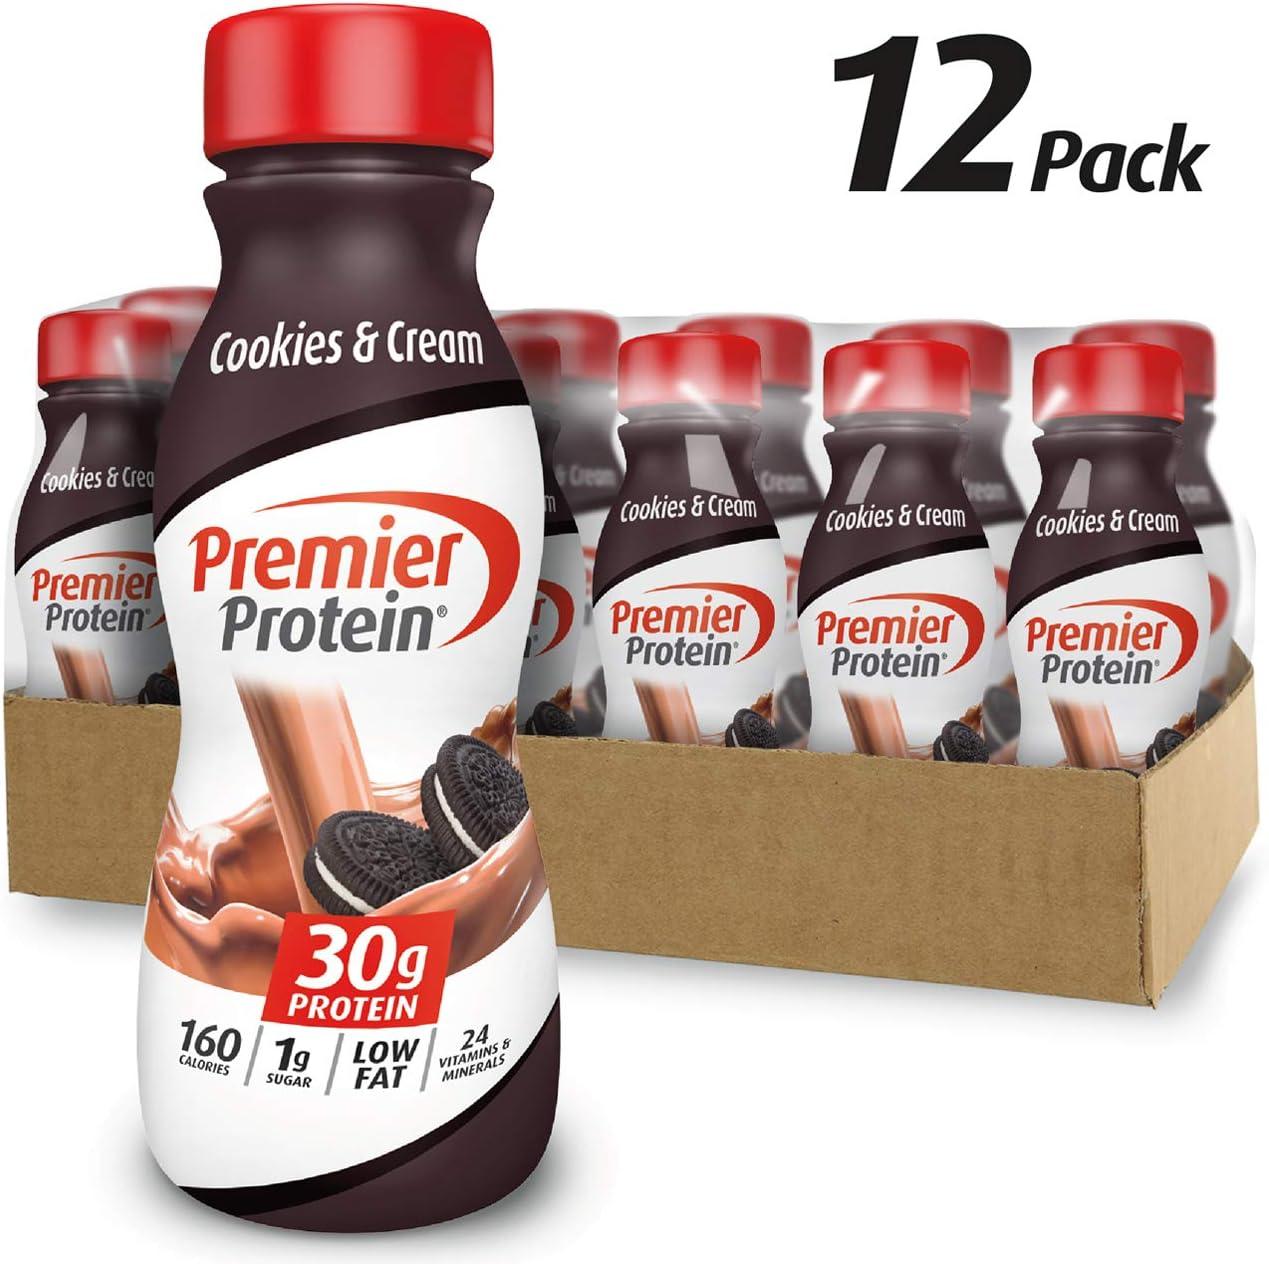 Premier Protein 30g Protein Shake, Cookies & Cream, 11.5 fl oz Shake, (12 count)